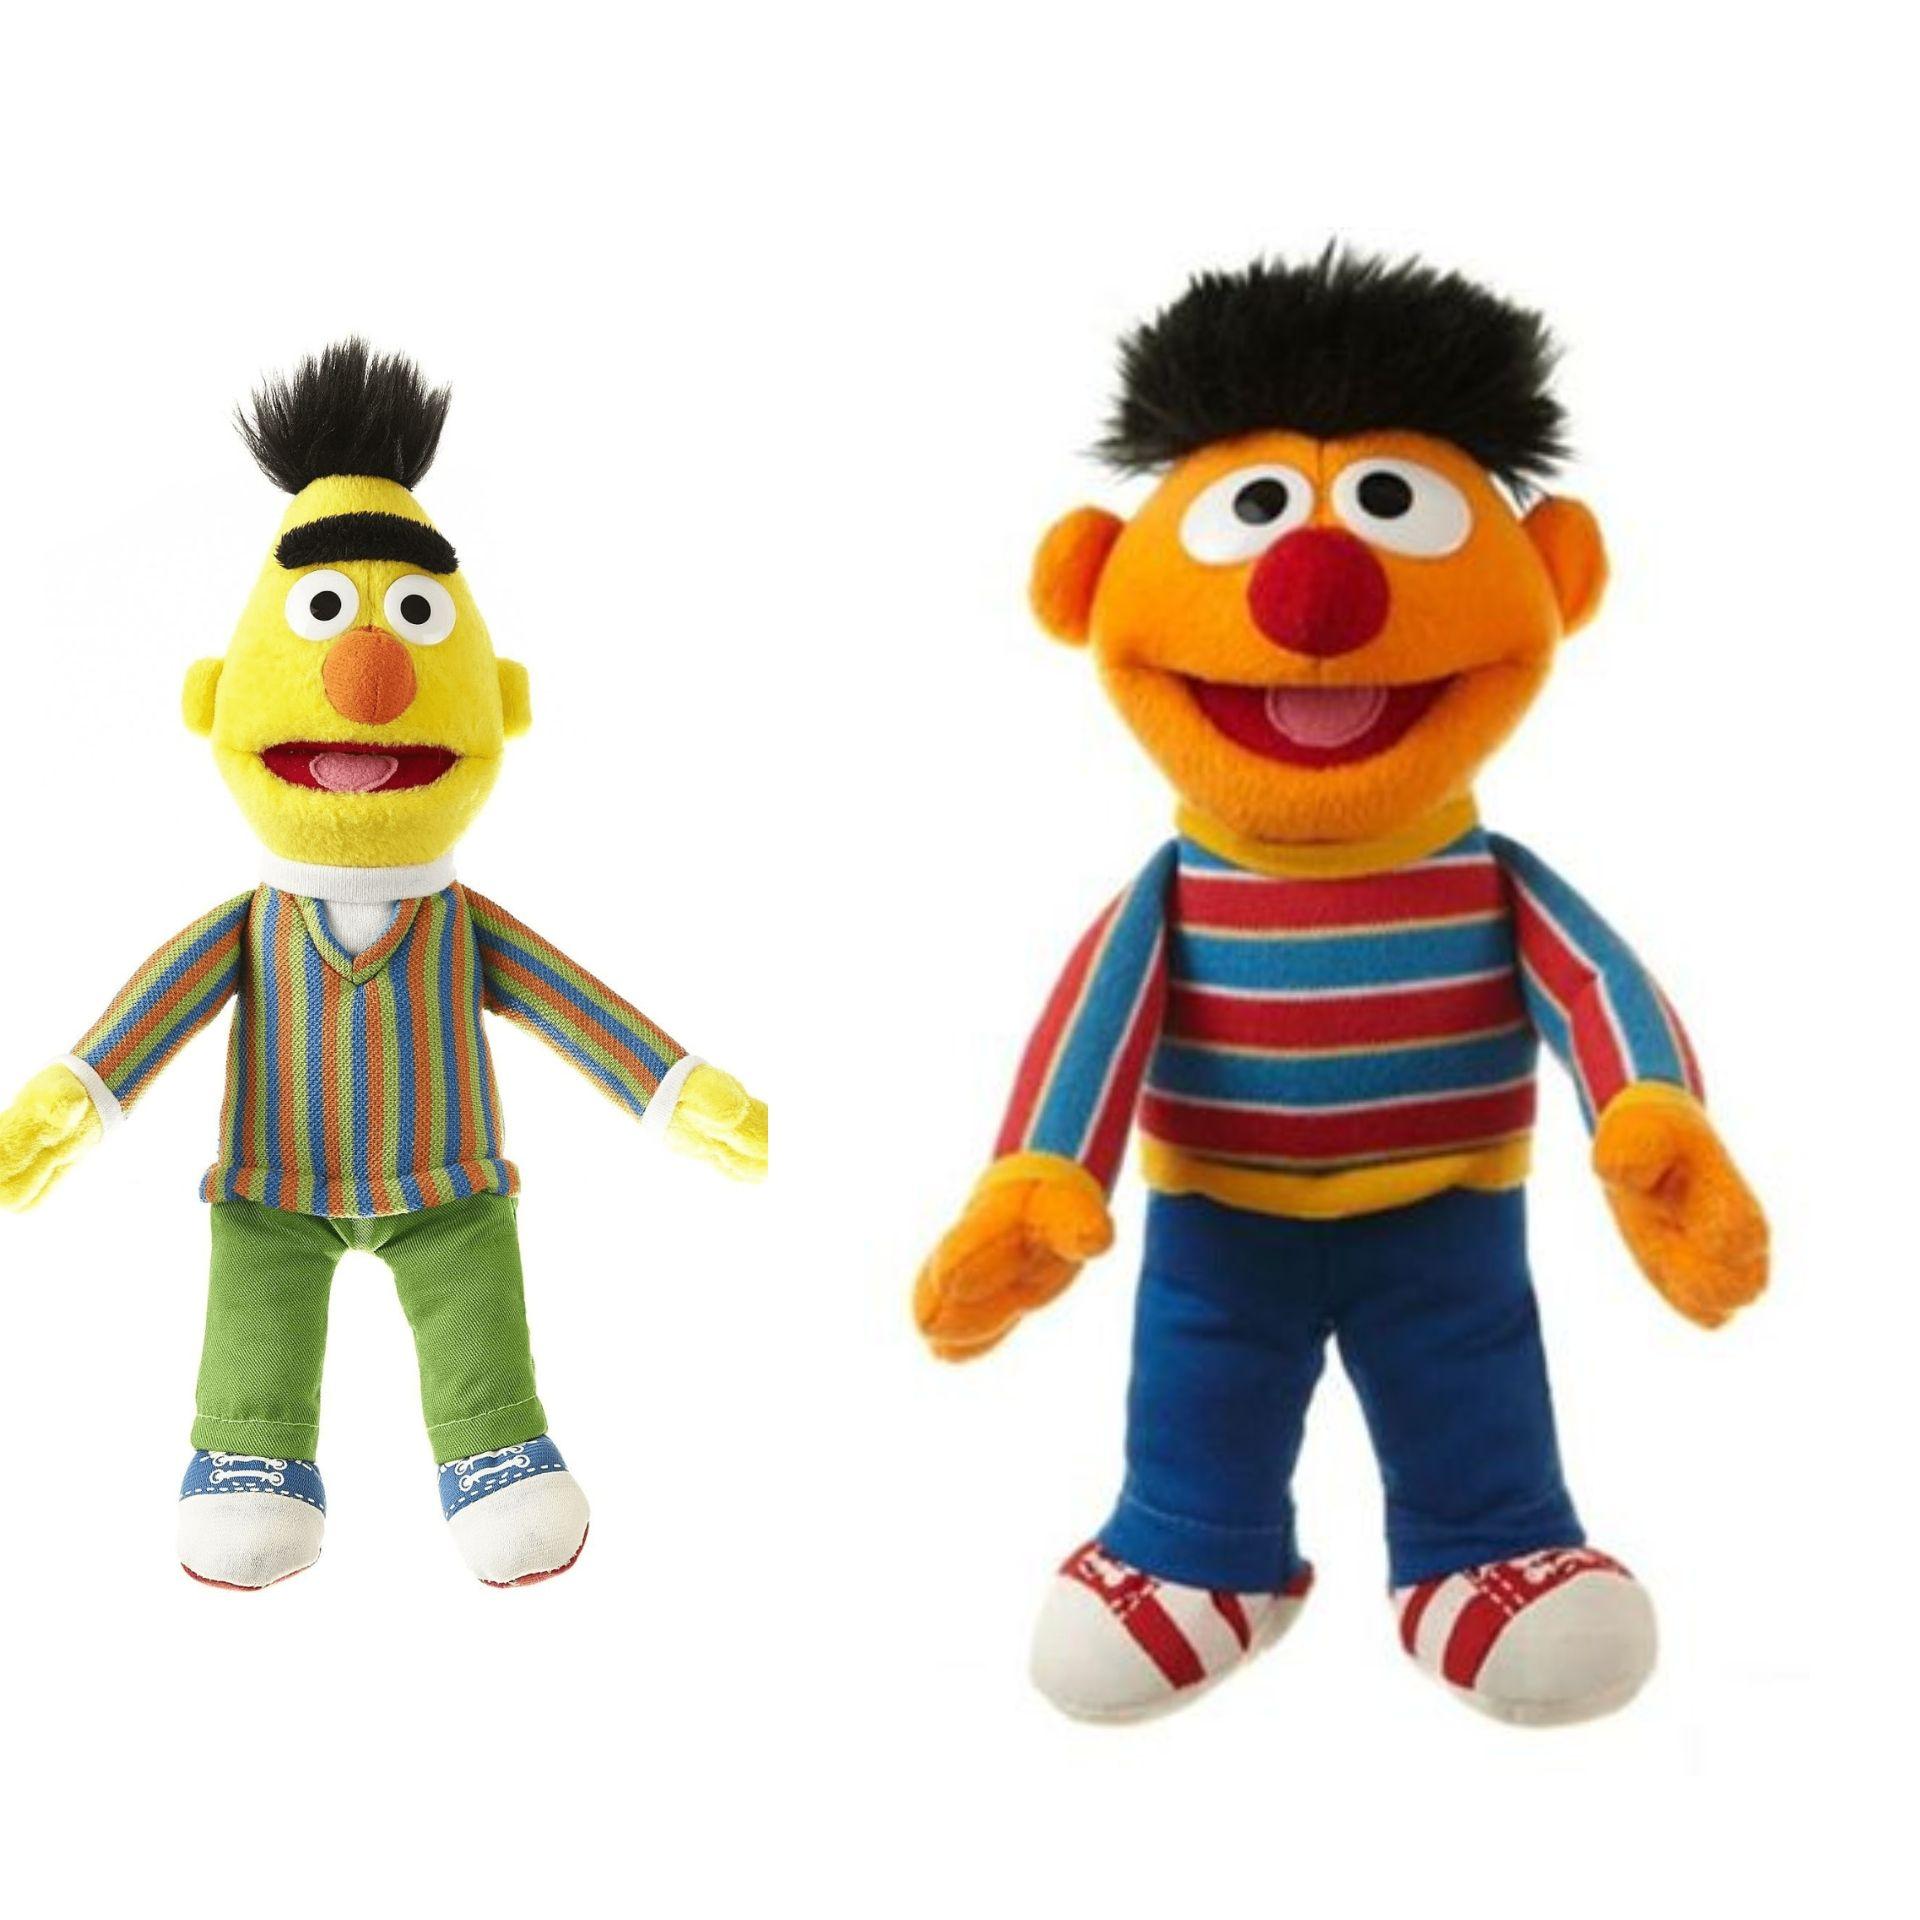 Living Puppets, Ernie oder Bert , ca. 20cm, Sesamstrasse, Plüschfigur, Kuscheltier